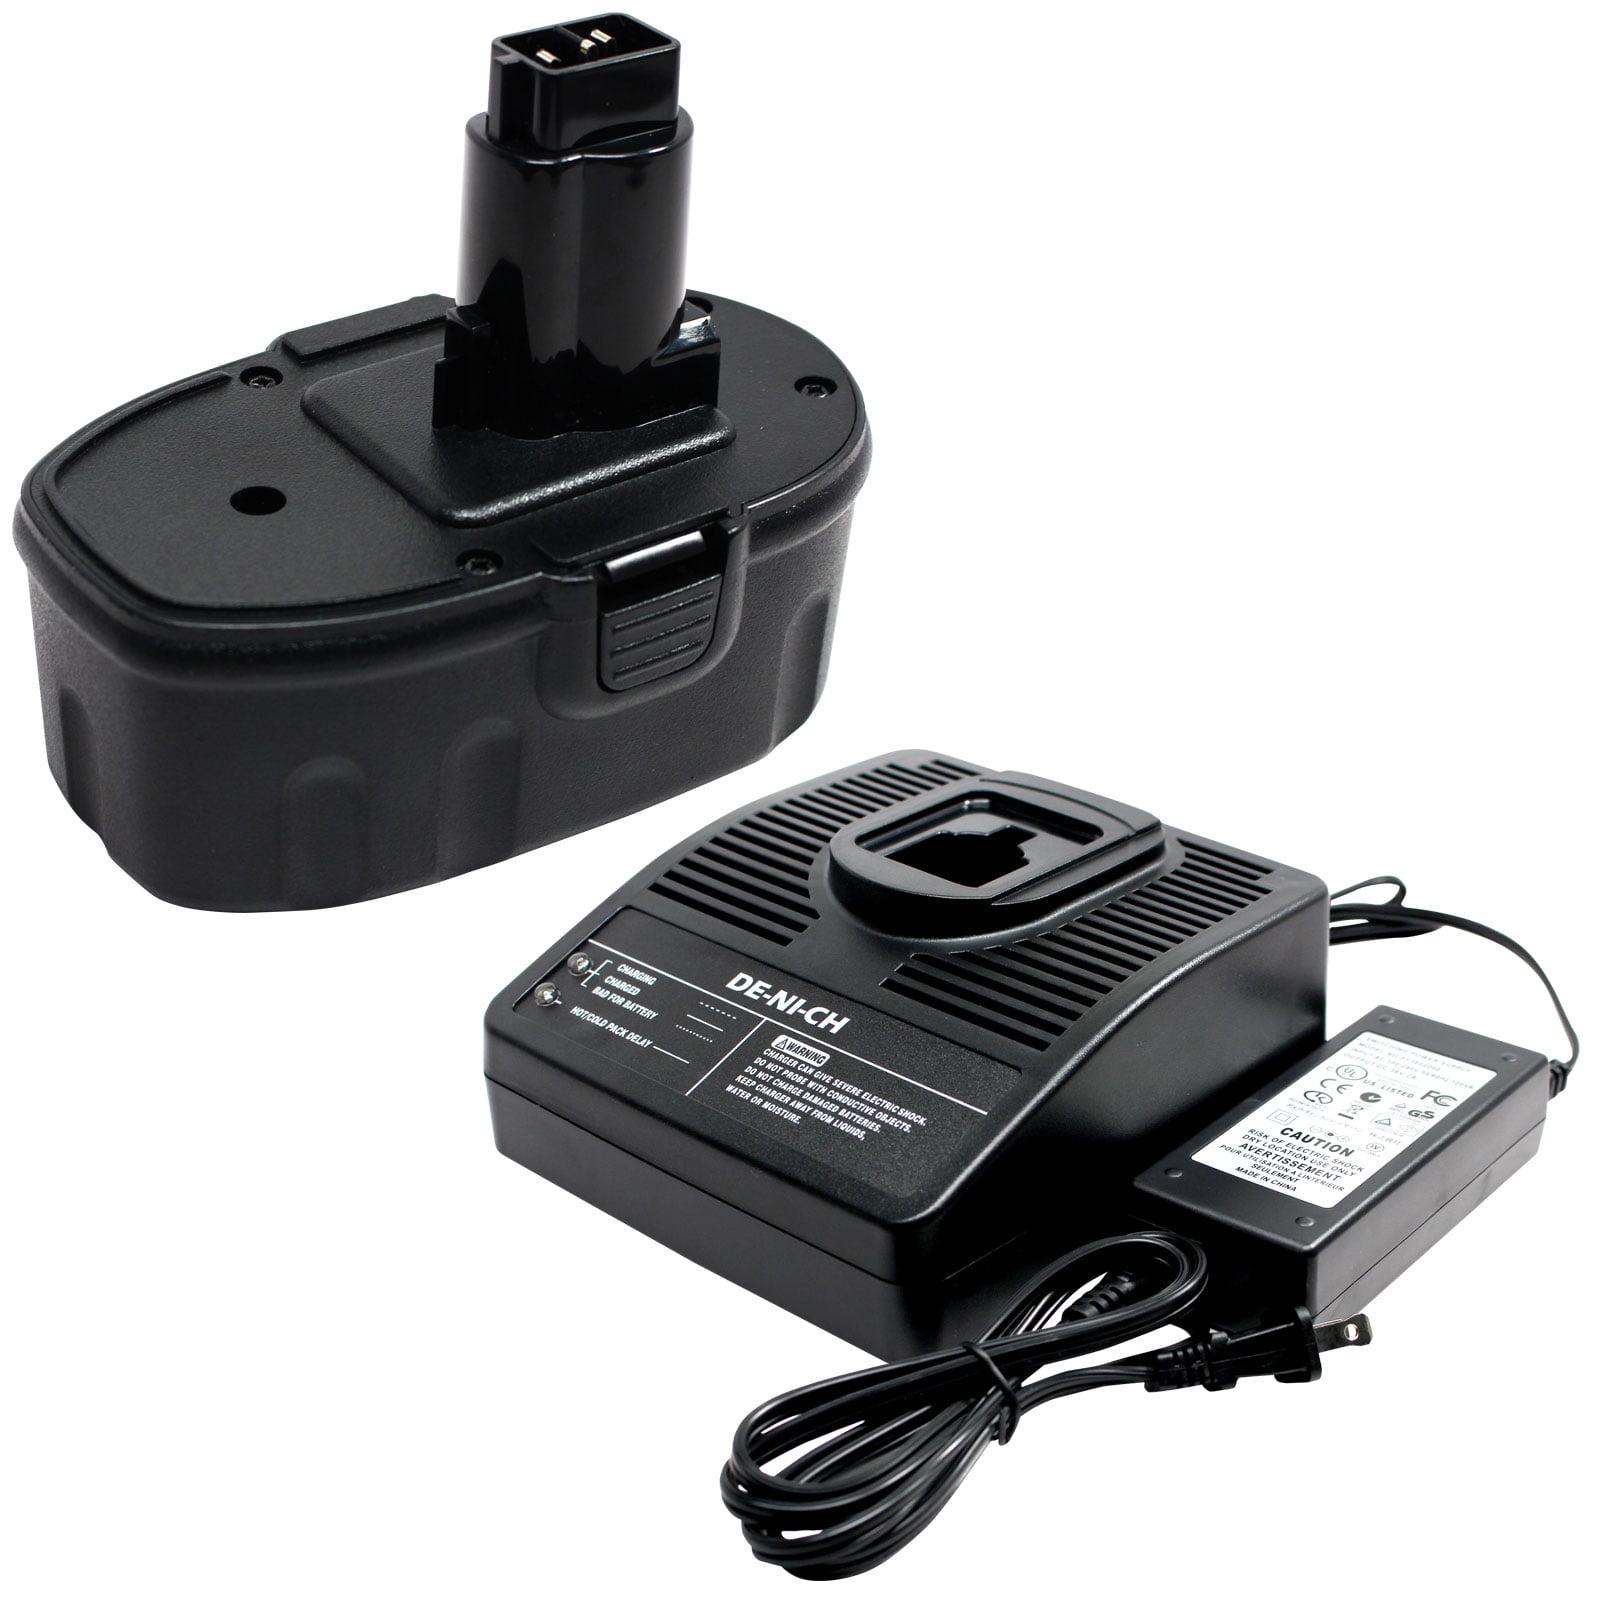 UpStart Battery DeWalt 18V Battery + Charger Replacement ...